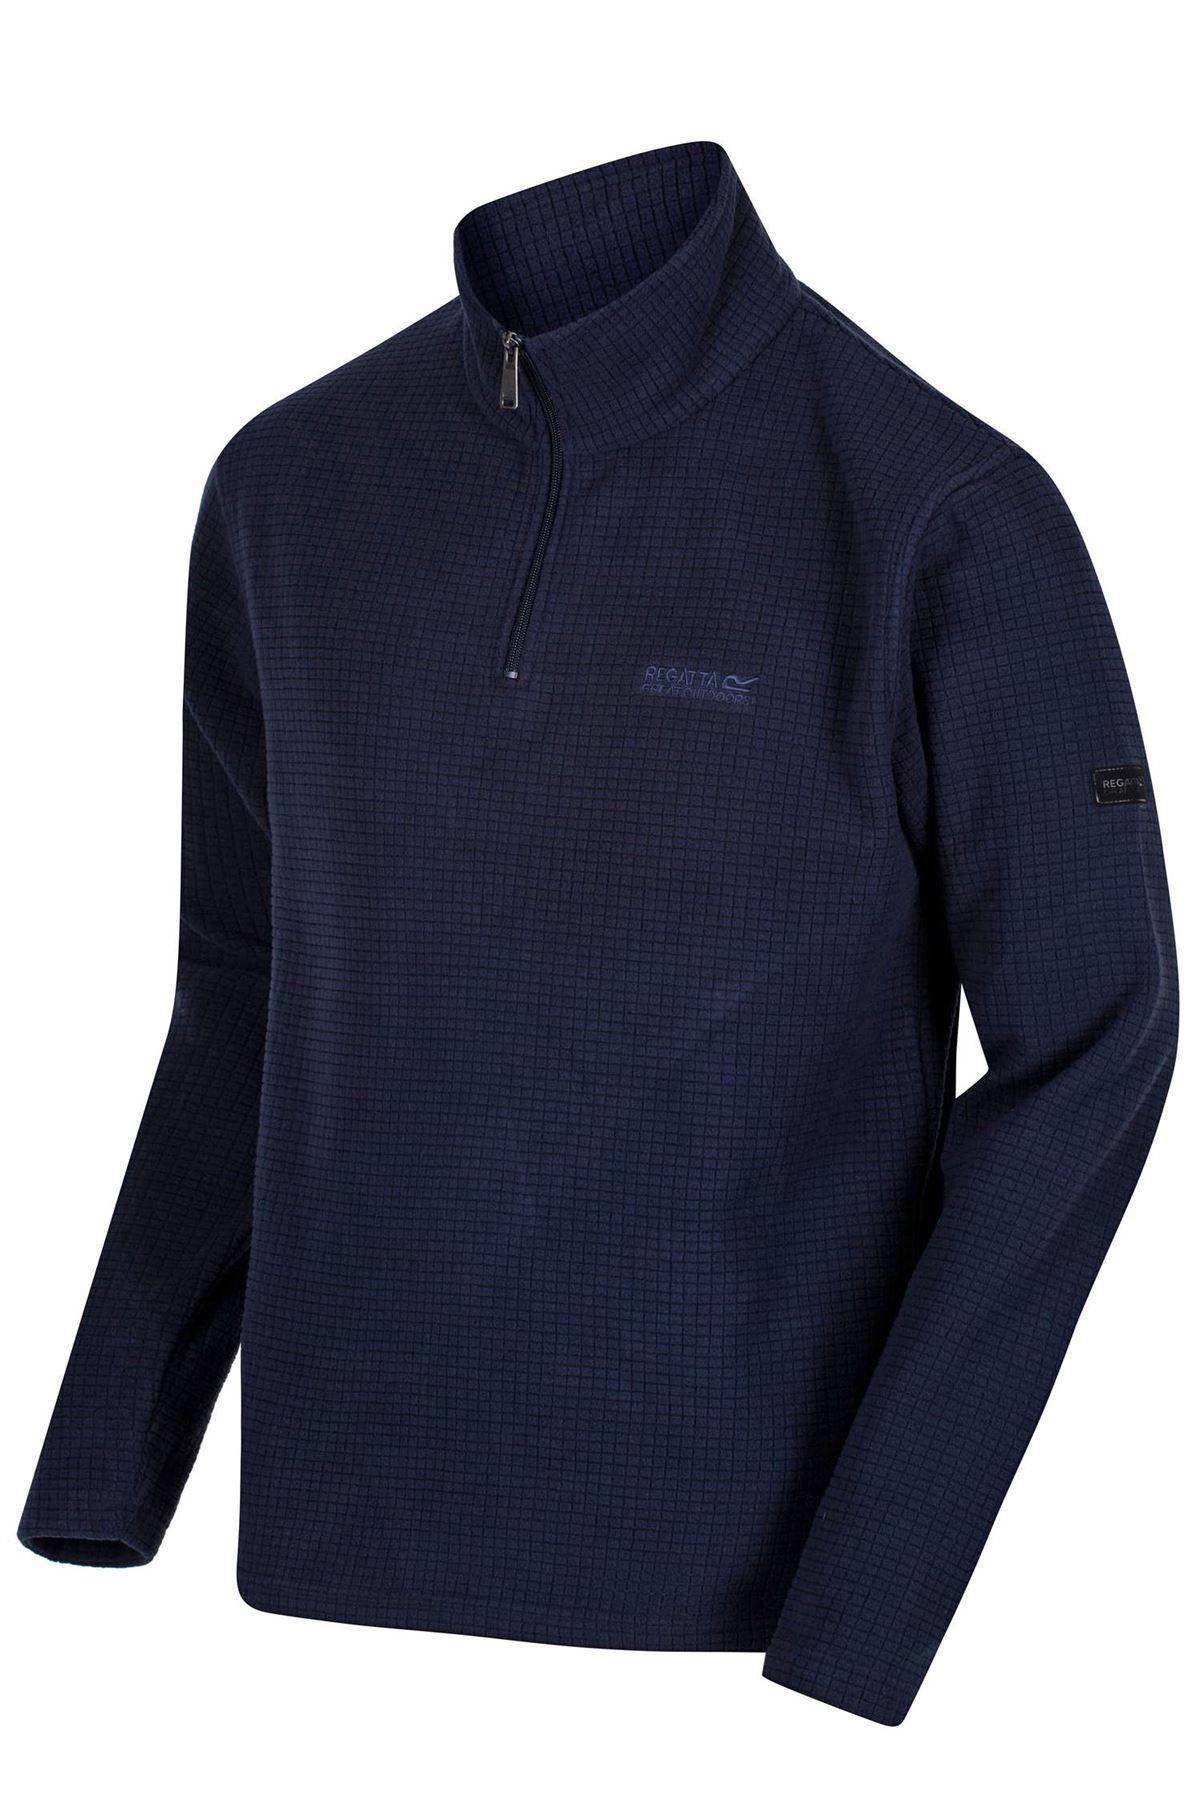 REGATTA-Mens-Half-Zip-Neck-Grid-Textured-Fleece-RRP-30 thumbnail 16